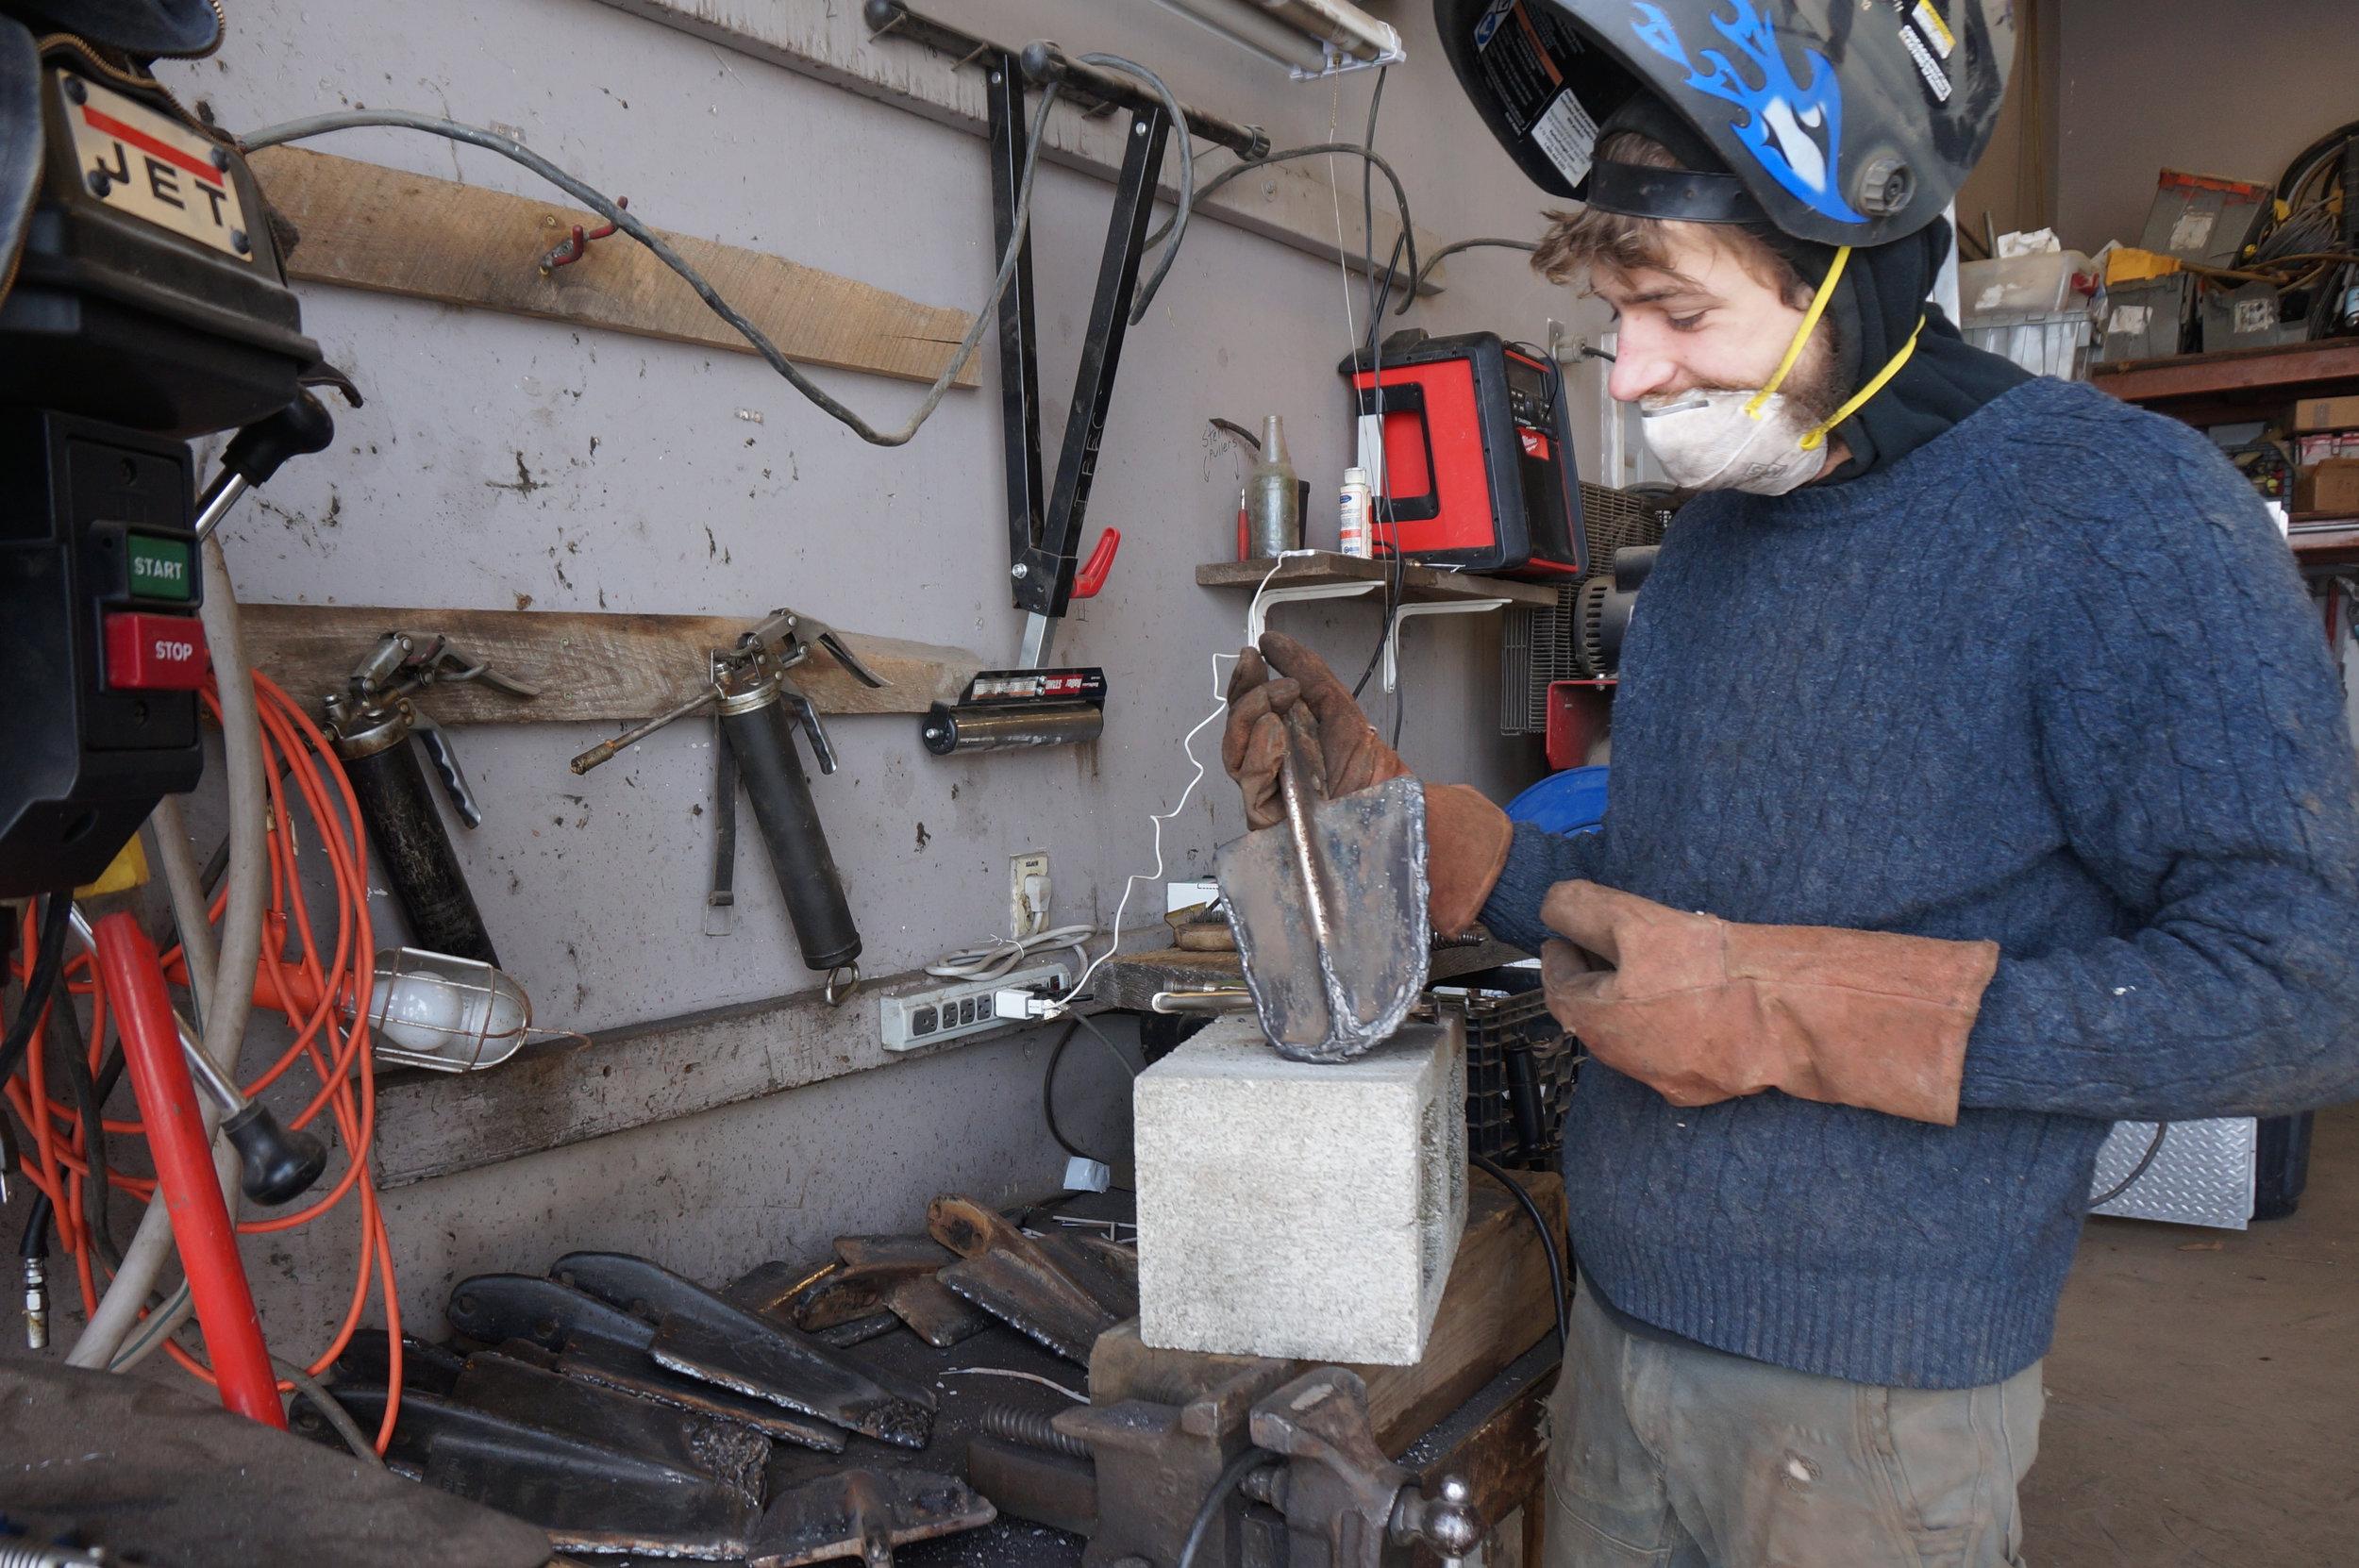 Sam Thomas inspecting worn spade